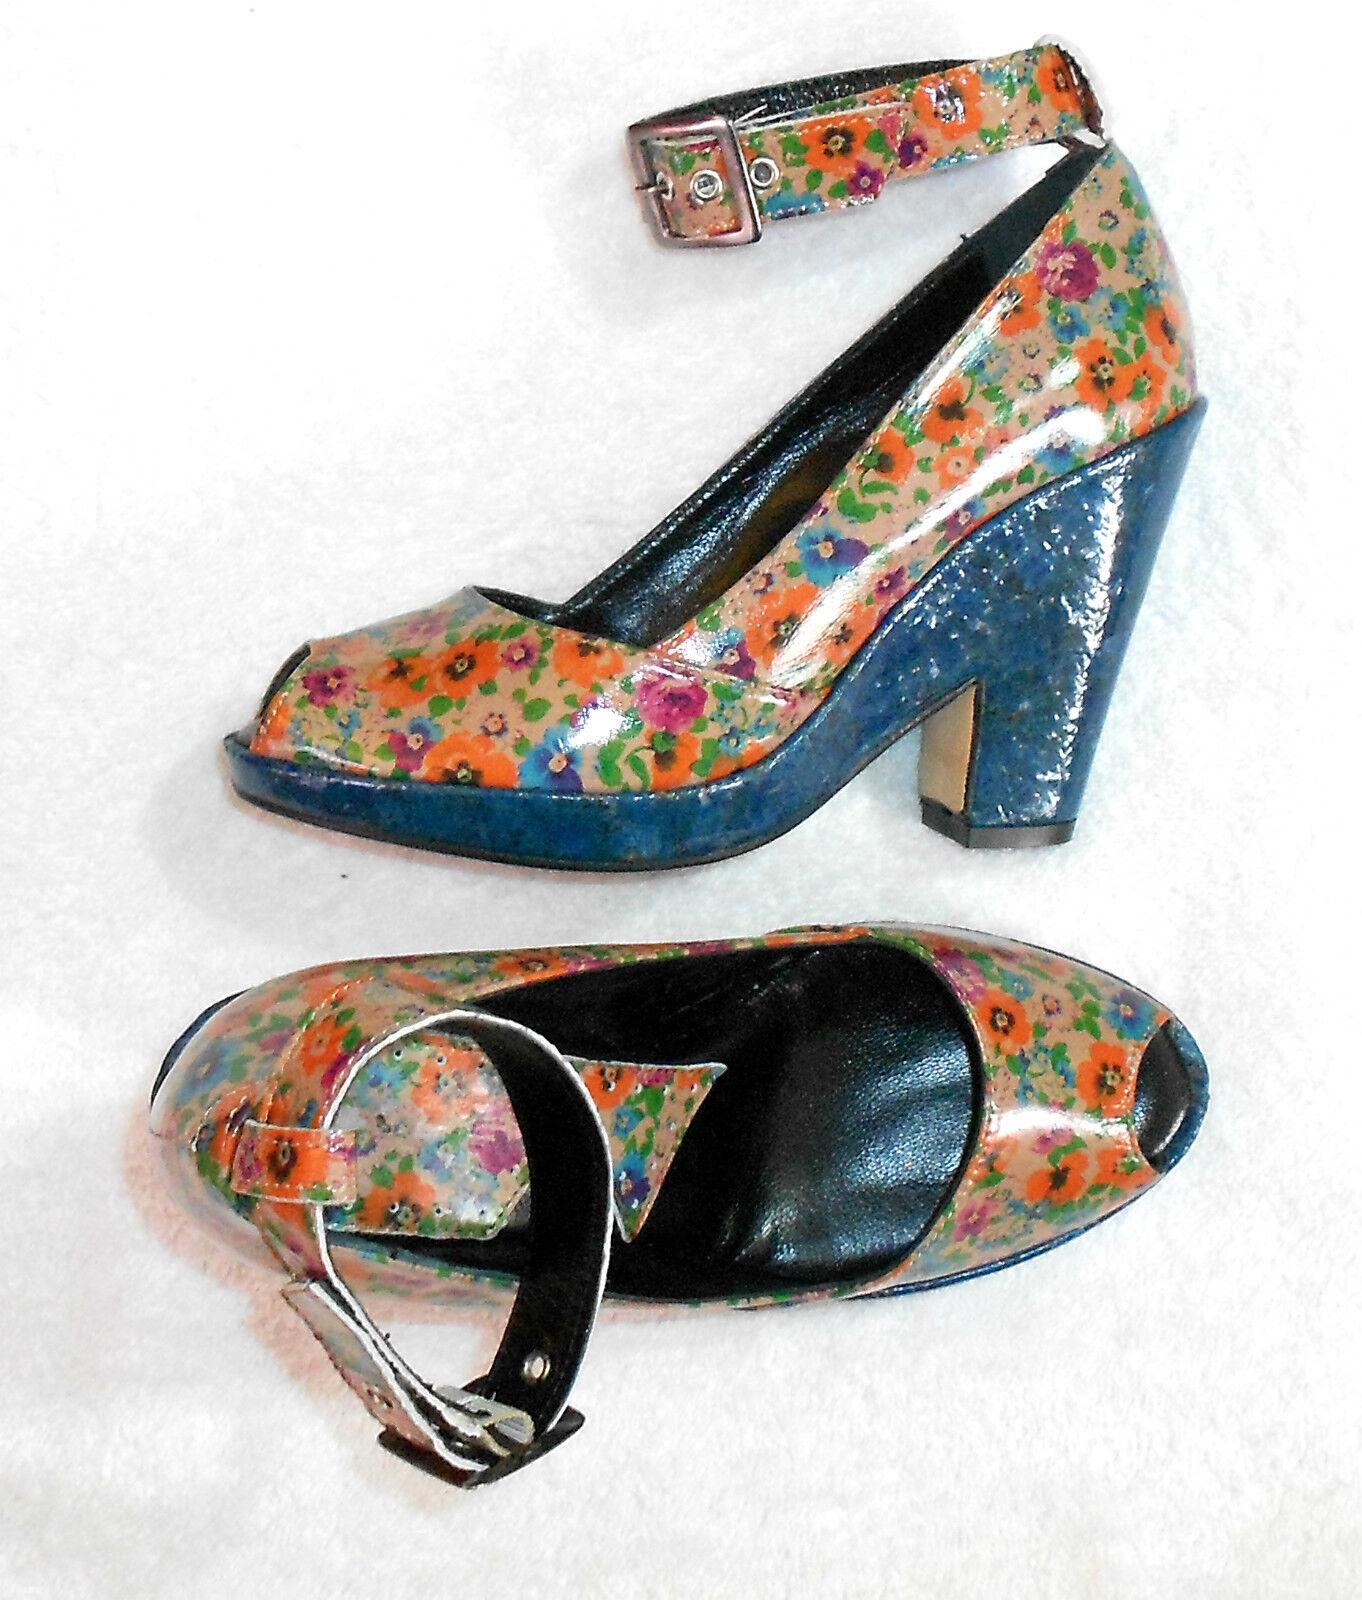 designer online IPPON STYL STYL STYL Escarpins sandales compensées cuir verni multicolore P 37 neufs  essere molto richiesto